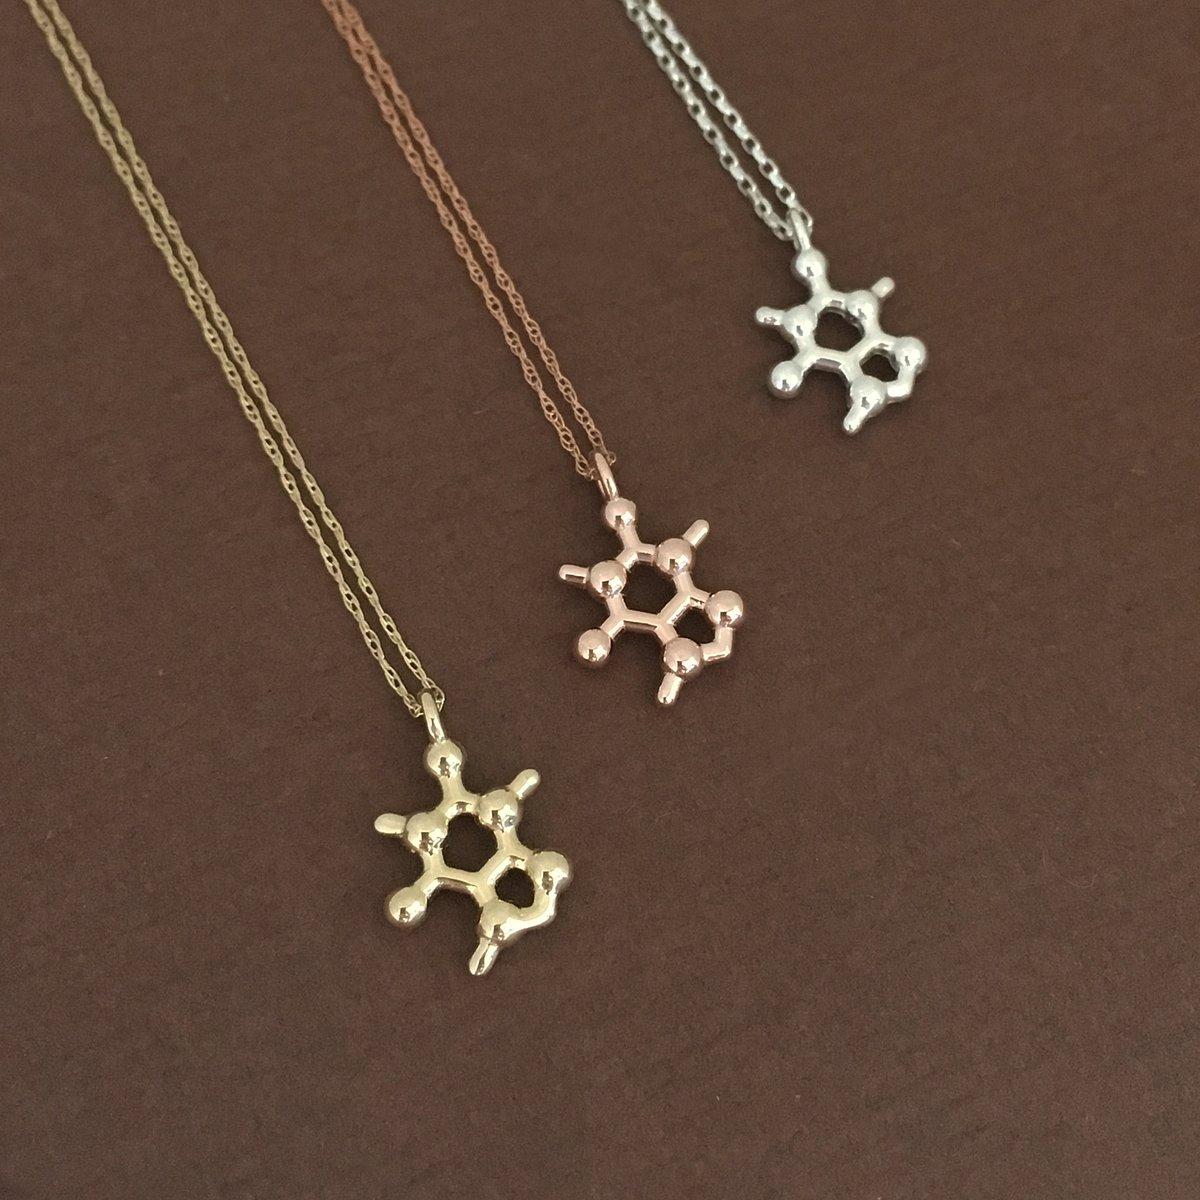 Image of tiny caffeine necklace